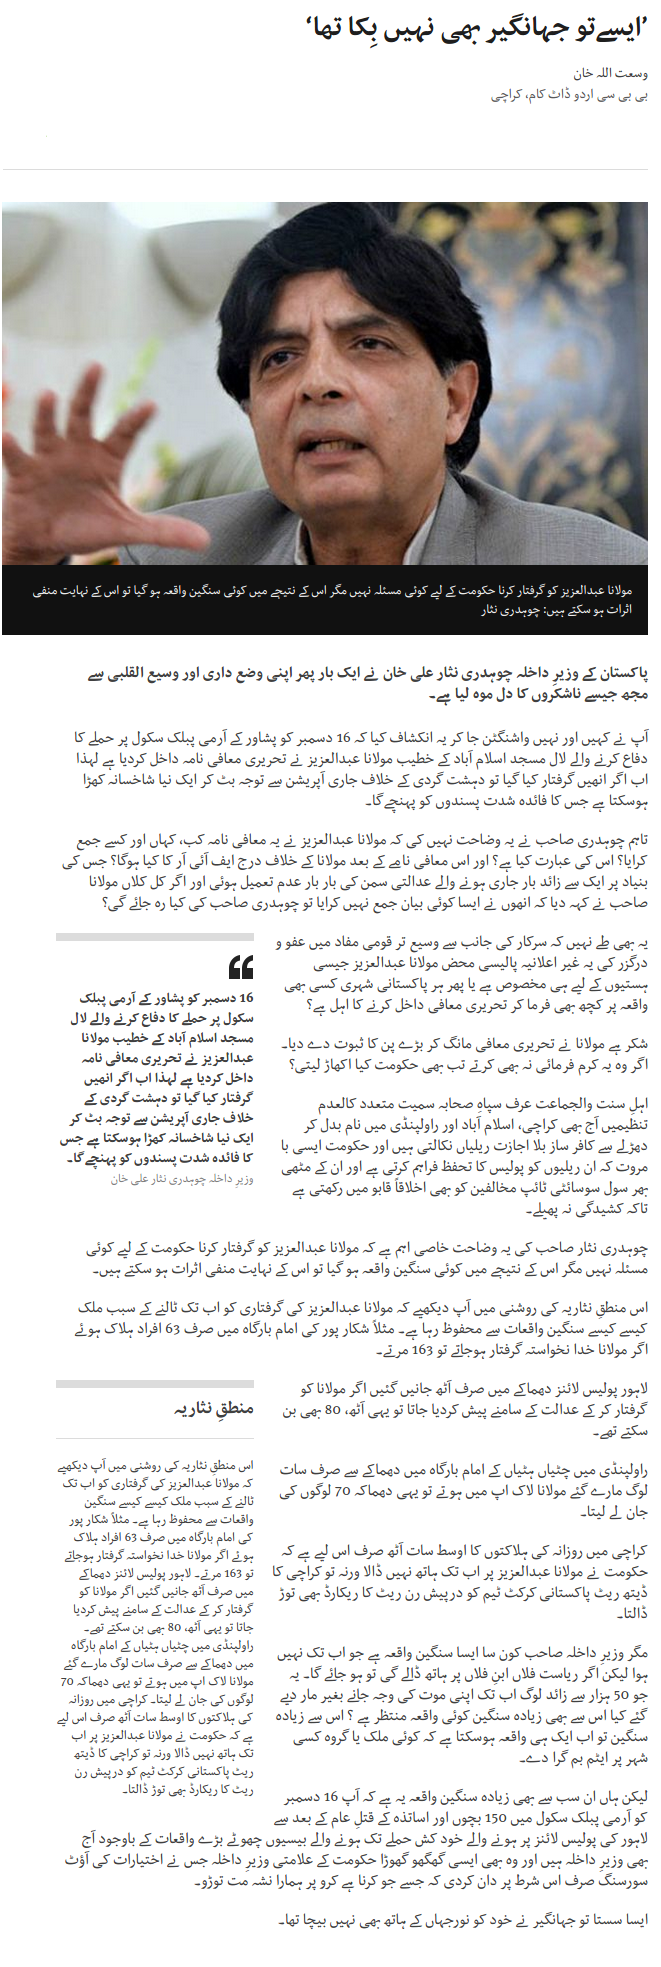 Aise To Jhangir Bhi Nahi Bika Tha By Wusatullah Khan